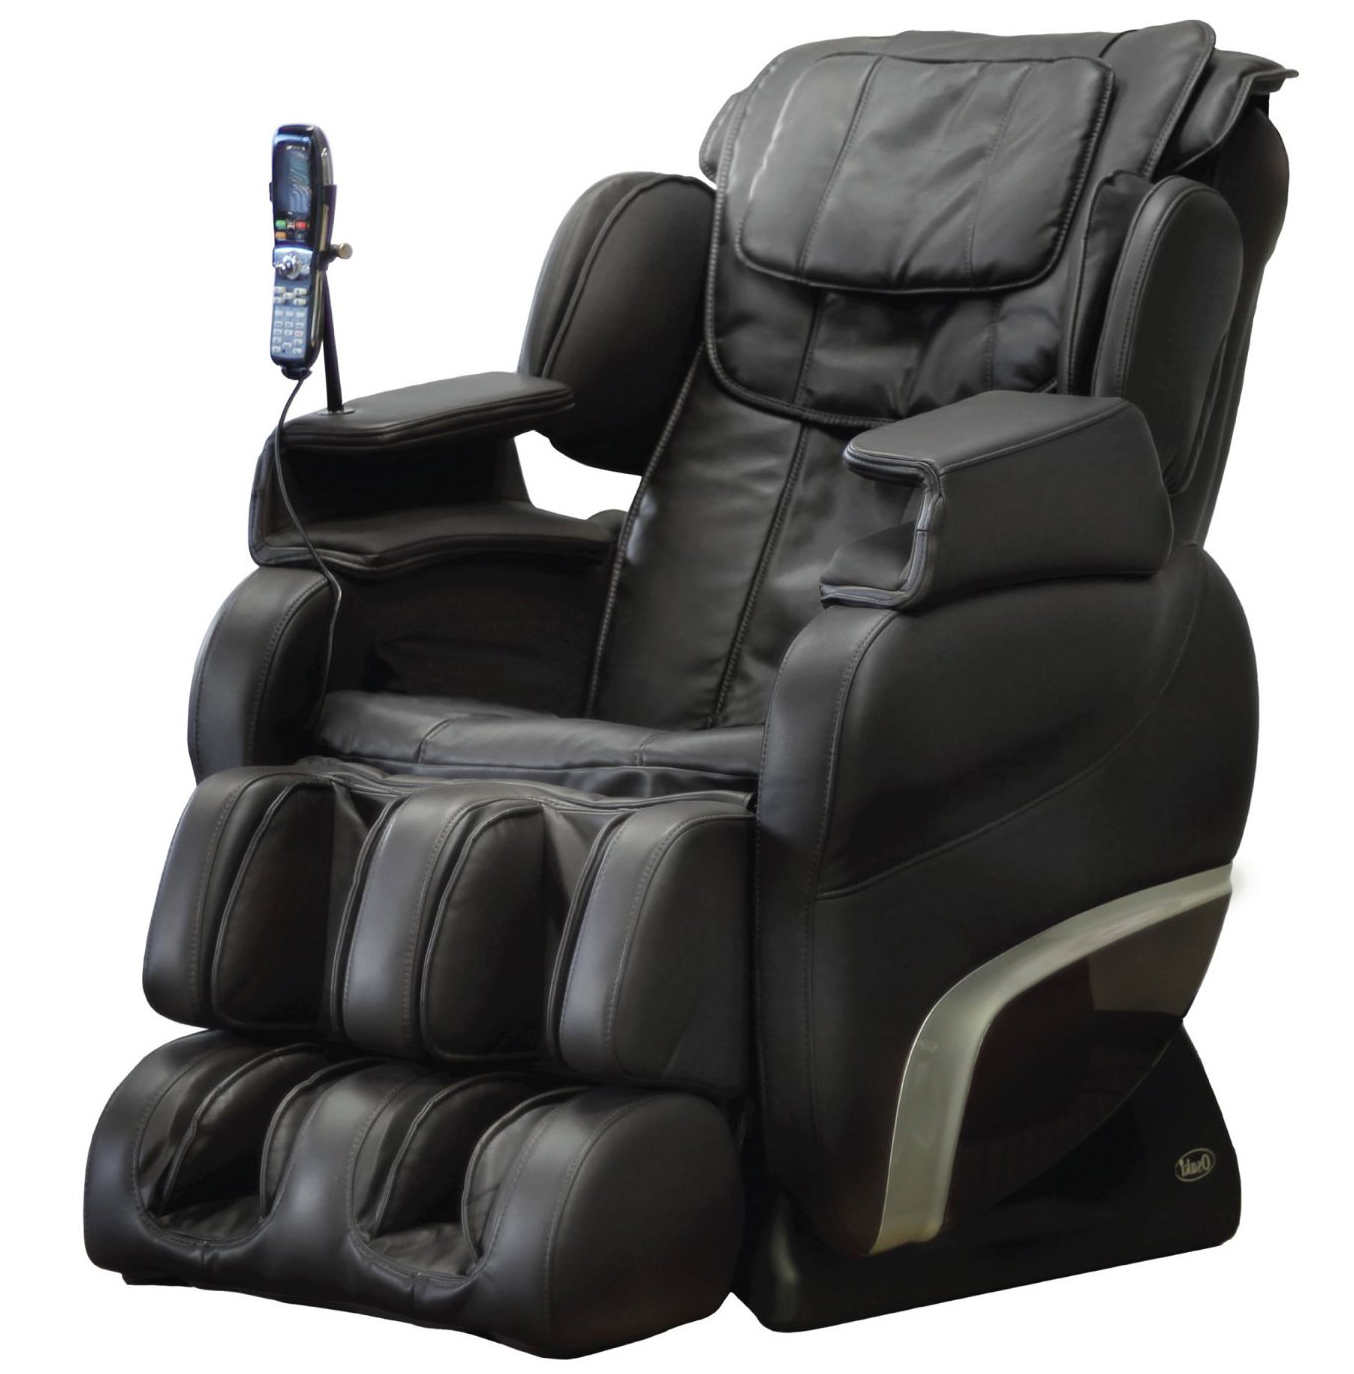 Titan Ti 7700r Massage Chair Recliner